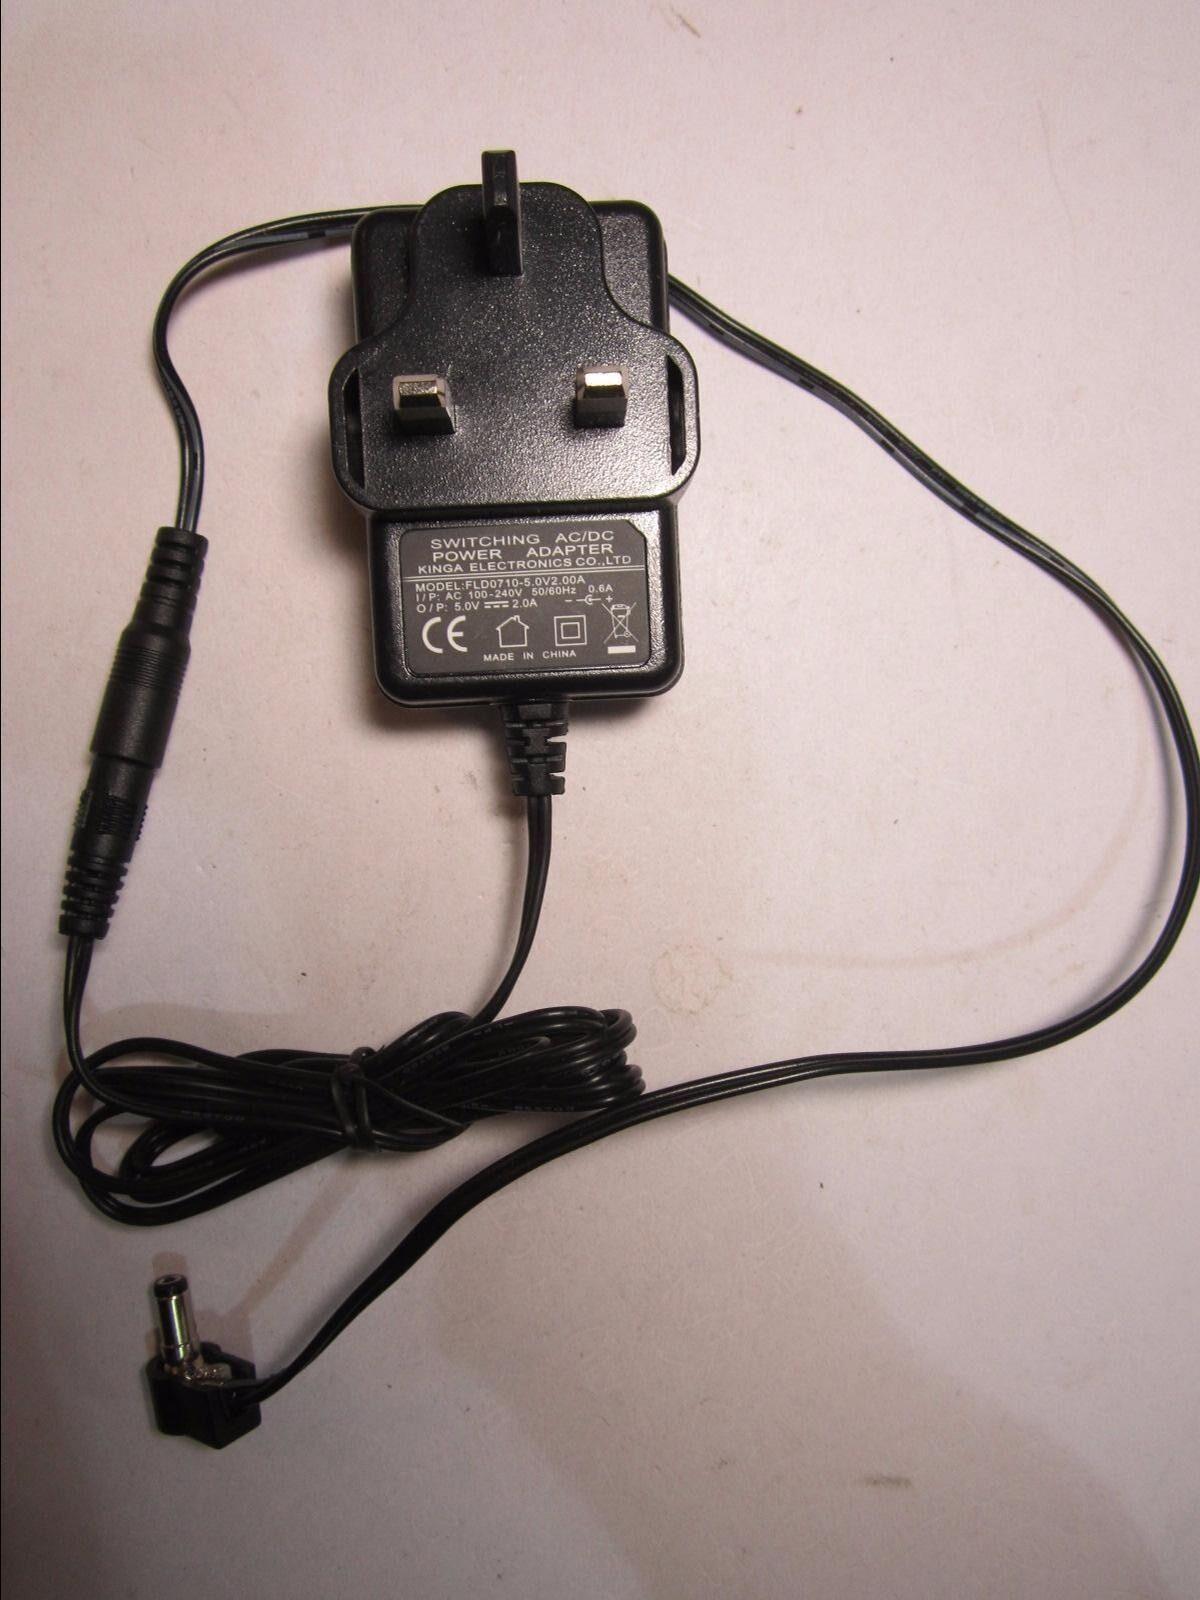 UK 5.0V 2000mA Mains AC-DC Adaptor Power Supply for ZB-01-5020EN HDMI Splitter